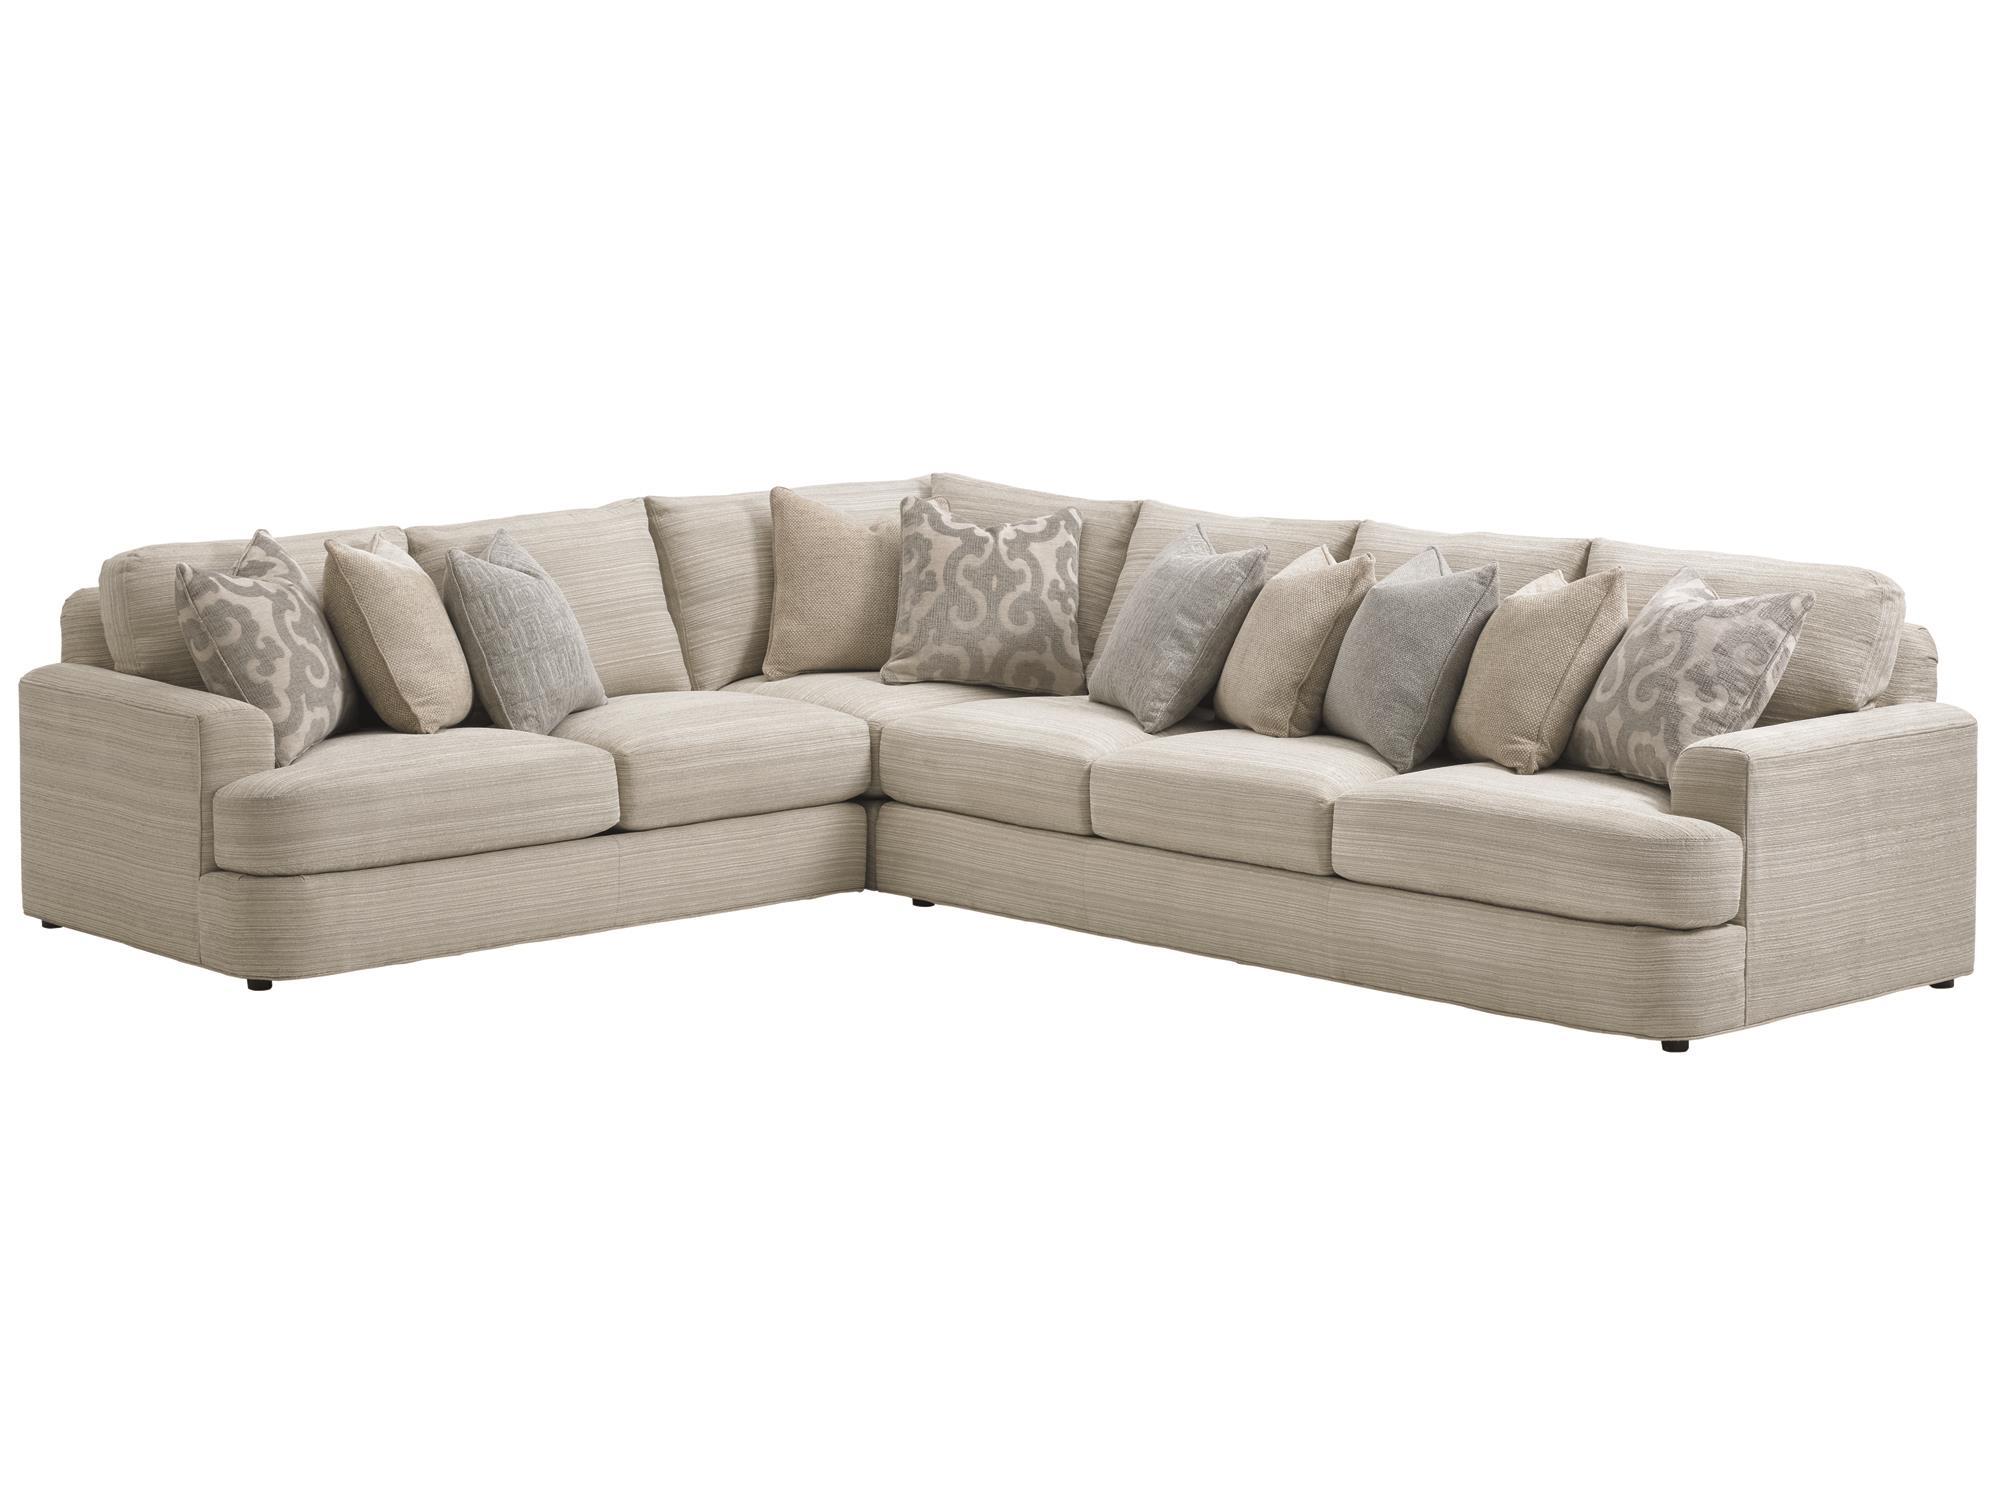 lexington sectional sofa havertys discontinued sofas laurel canyon halandale two piece